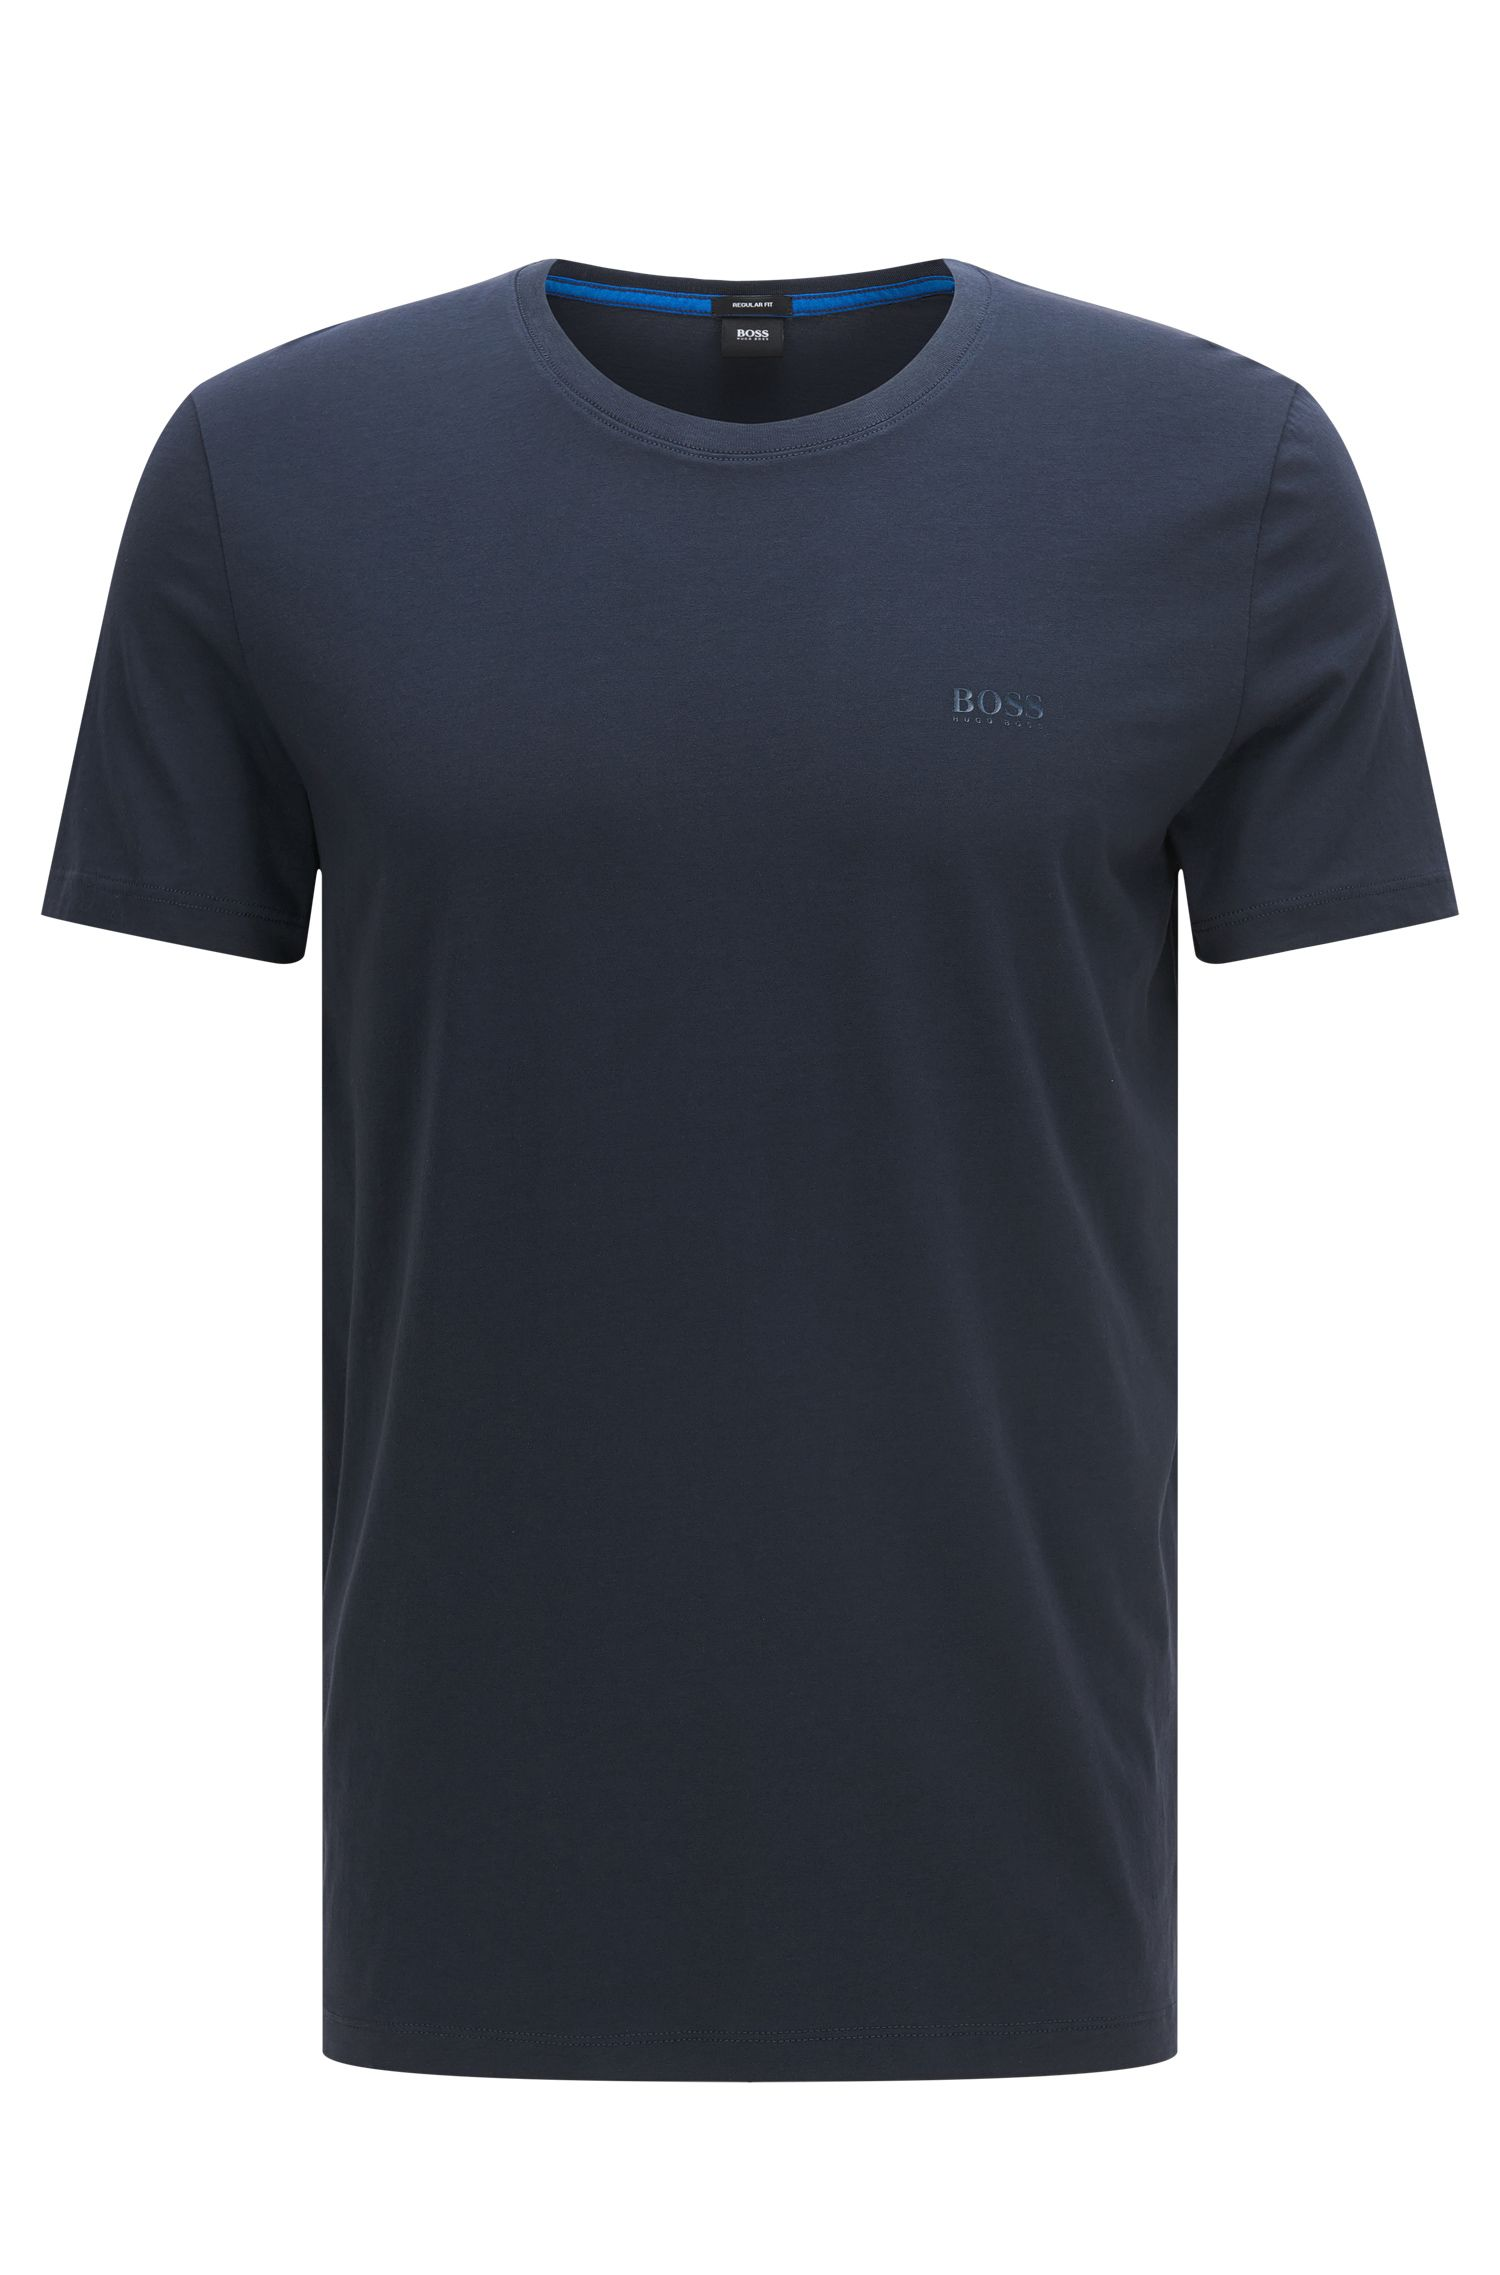 Camiseta regular fit en algodón suave